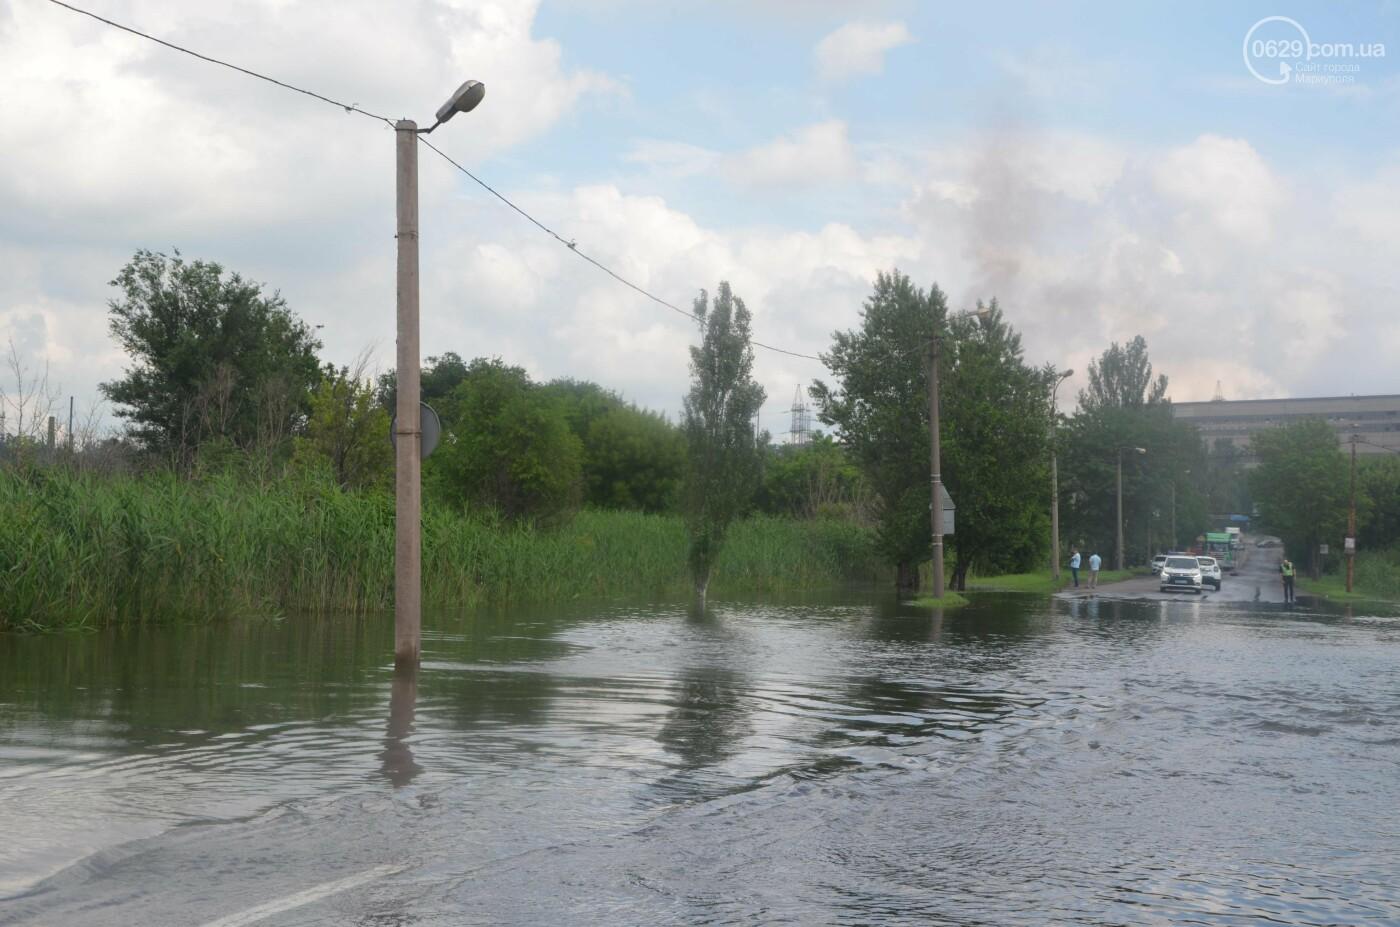 Разлилась река. В Мариуполе затопило дорогу, - ФОТОРЕПОРТАЖ, фото-1